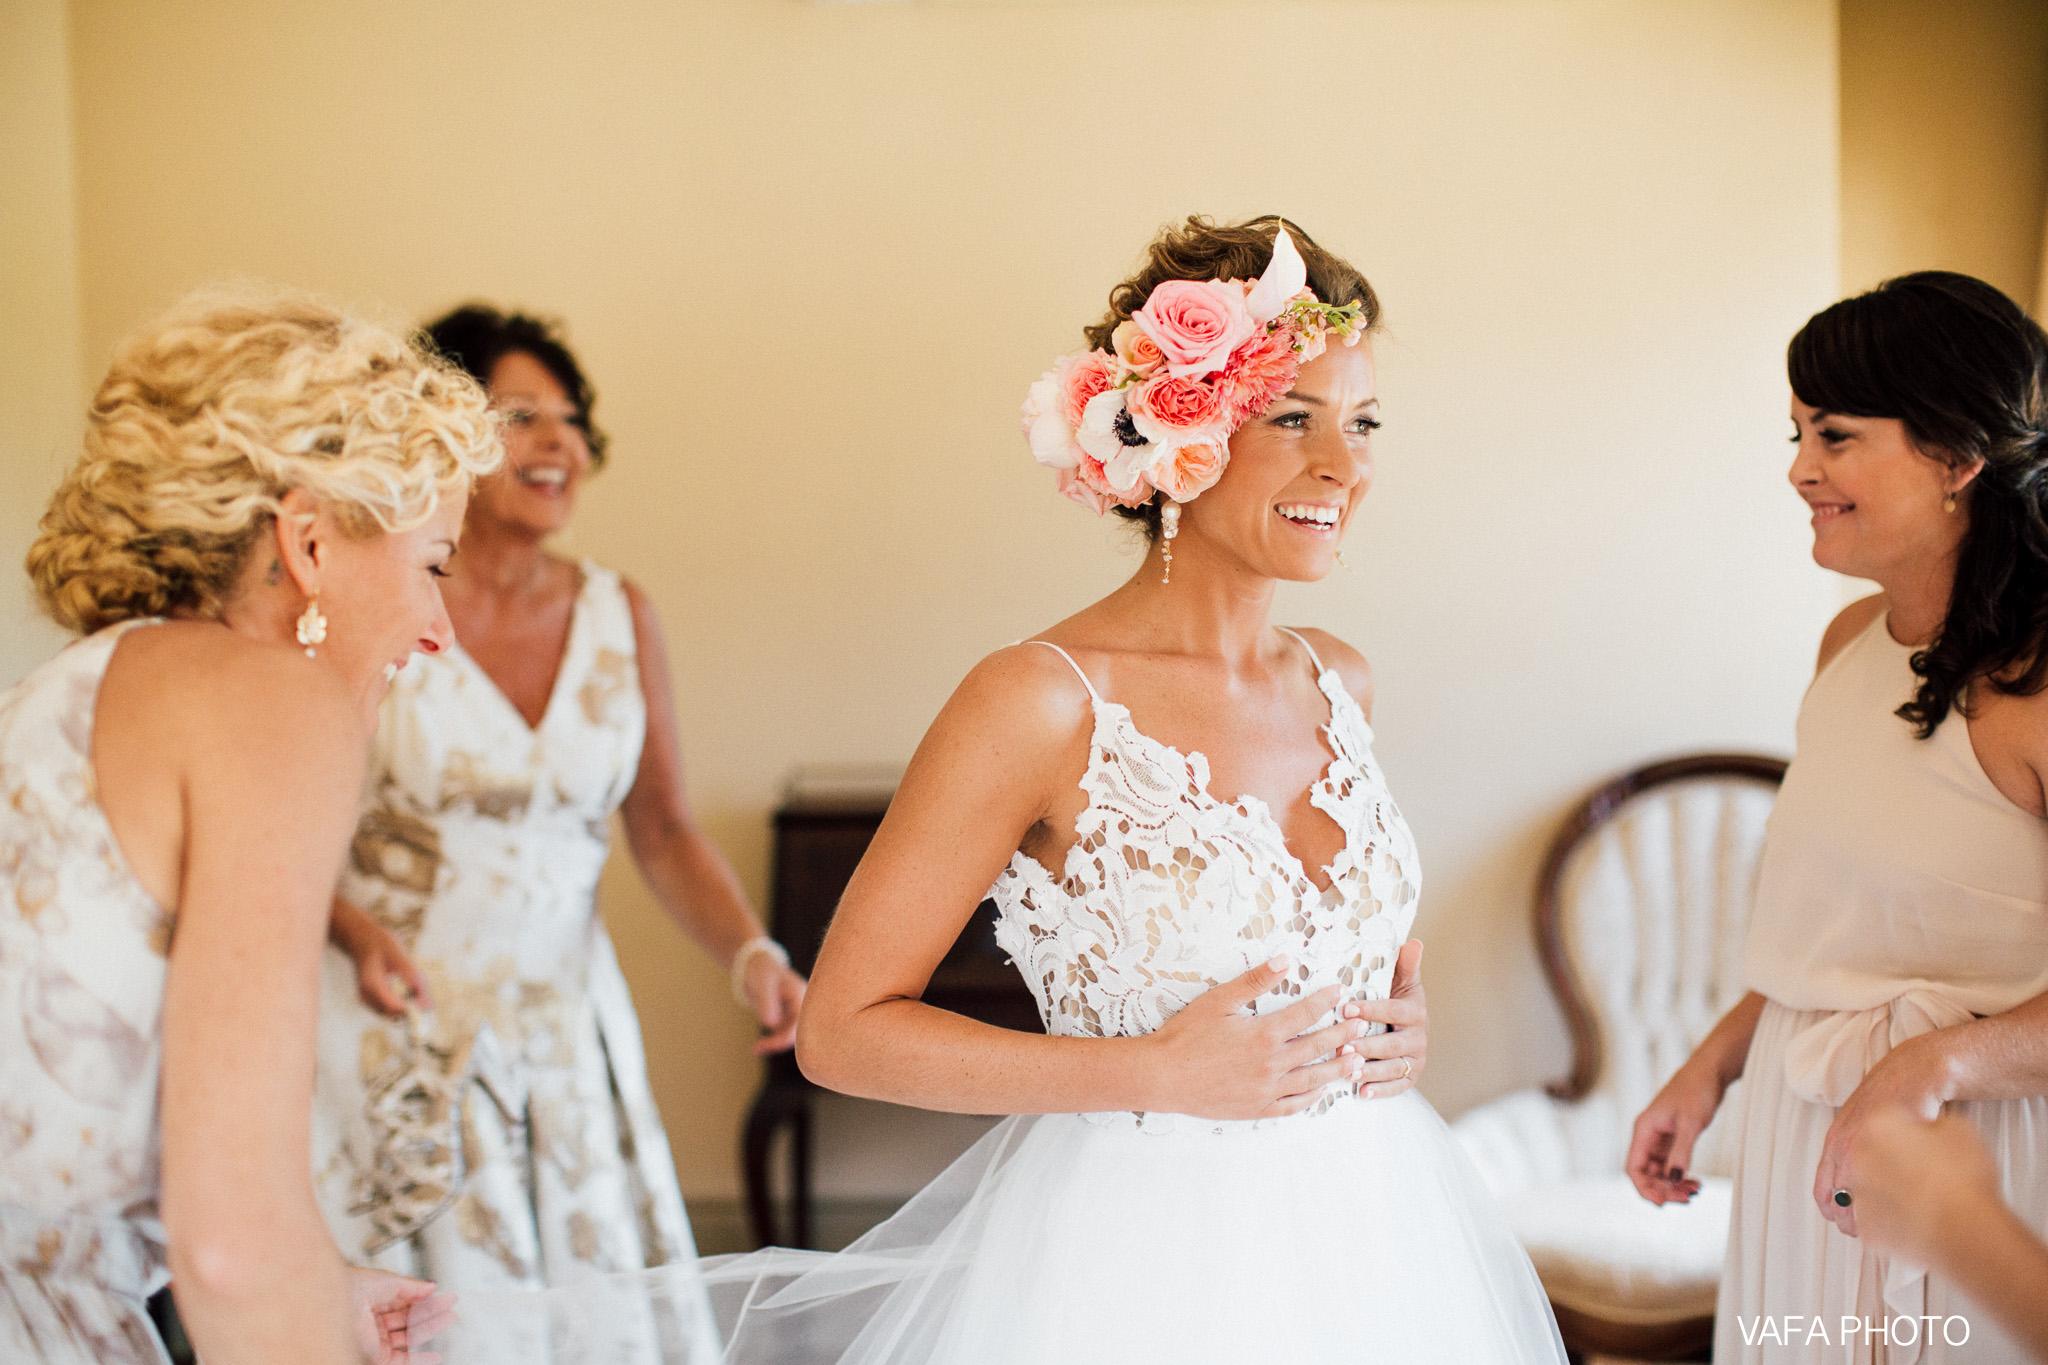 The-Felt-Estate-Wedding-Kailie-David-Vafa-Photo-162.jpg